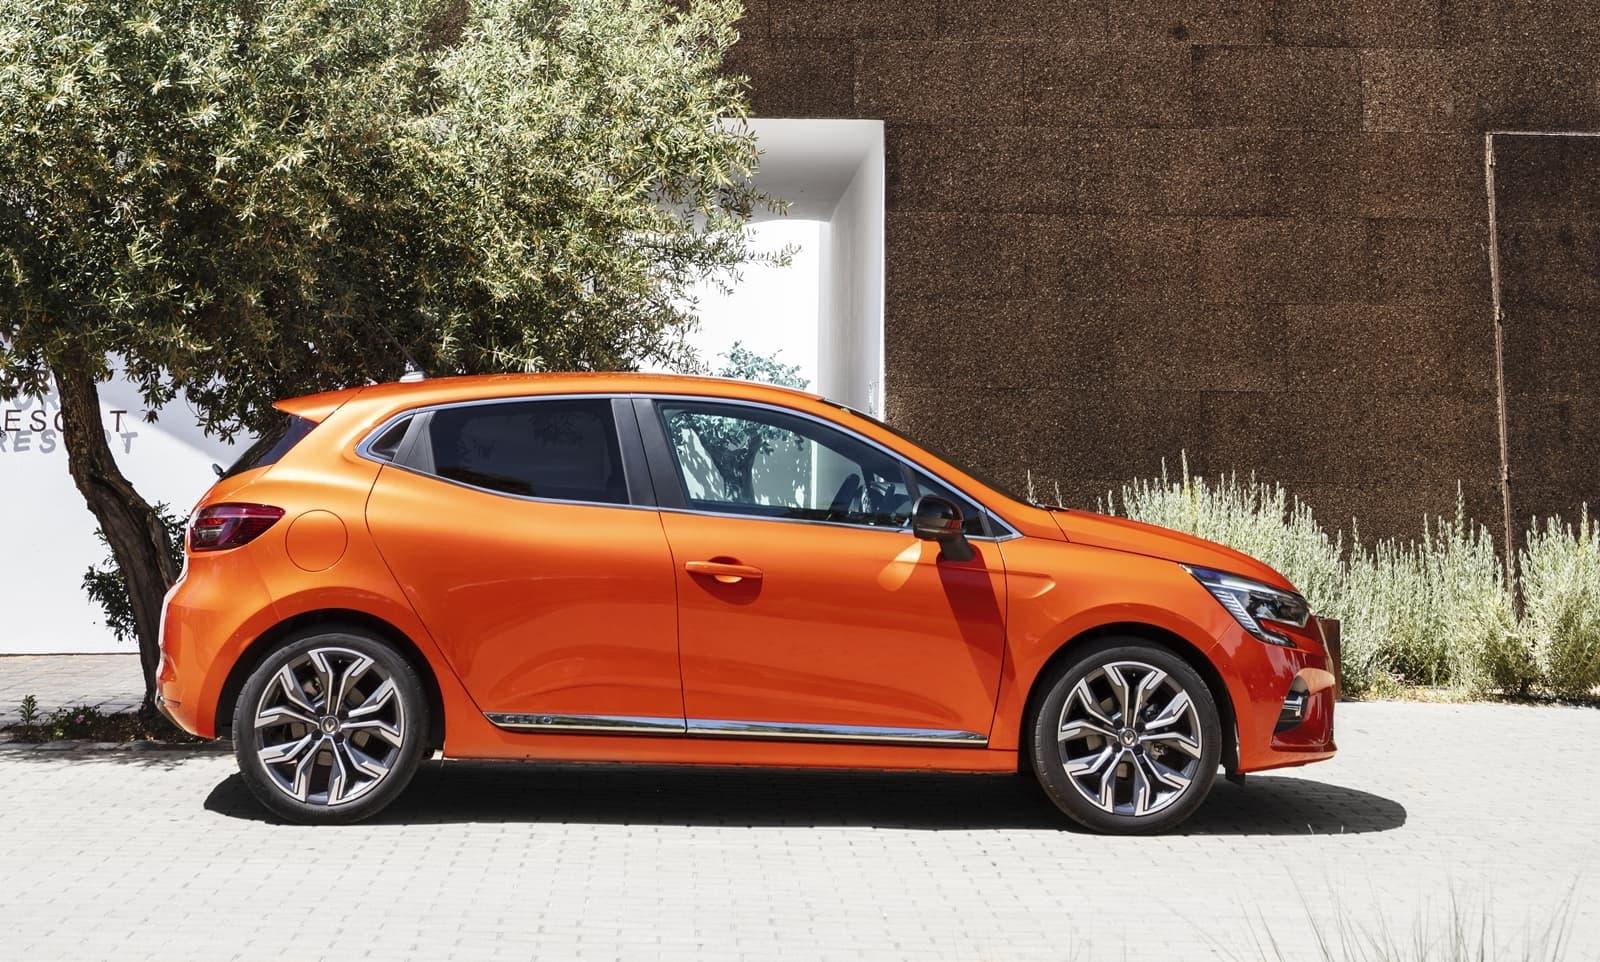 Renault Clio 2020 Prueba 0619 018